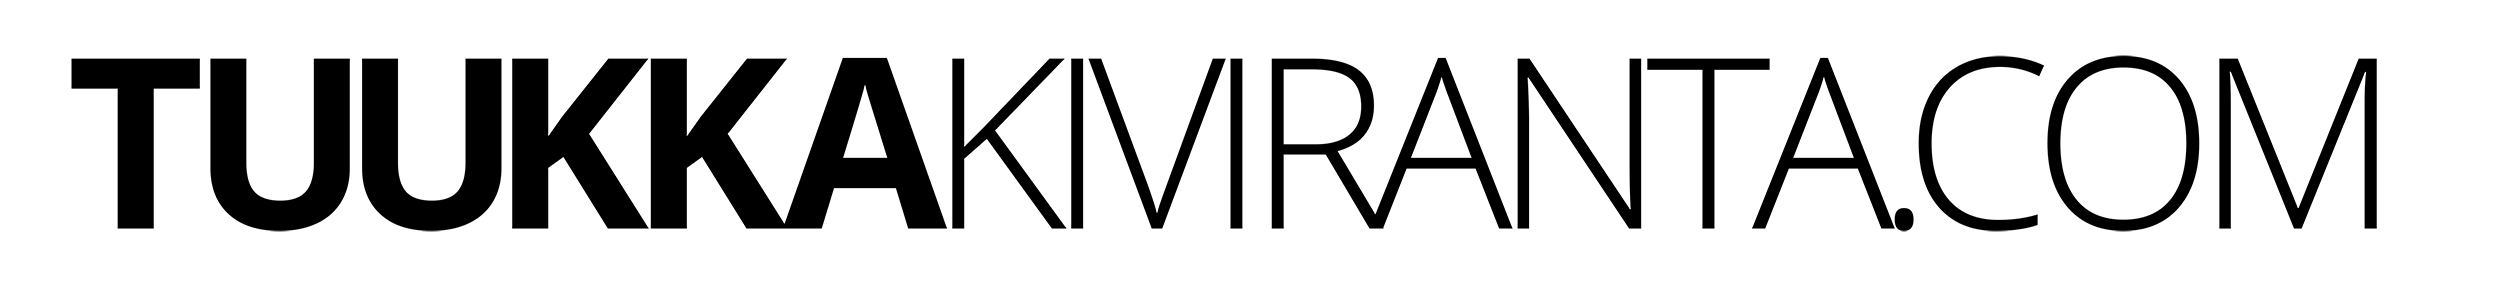 Valokuvaaja ja videokuvaaja Tuukka Kiviranta | Valokuvaus, Videokuvaus, Valokuvaaja, Videokuvaaja, Freelancer, Lehtikuvaaja, Hääkuvaus, Kopterikuvaus, Seinäjoki